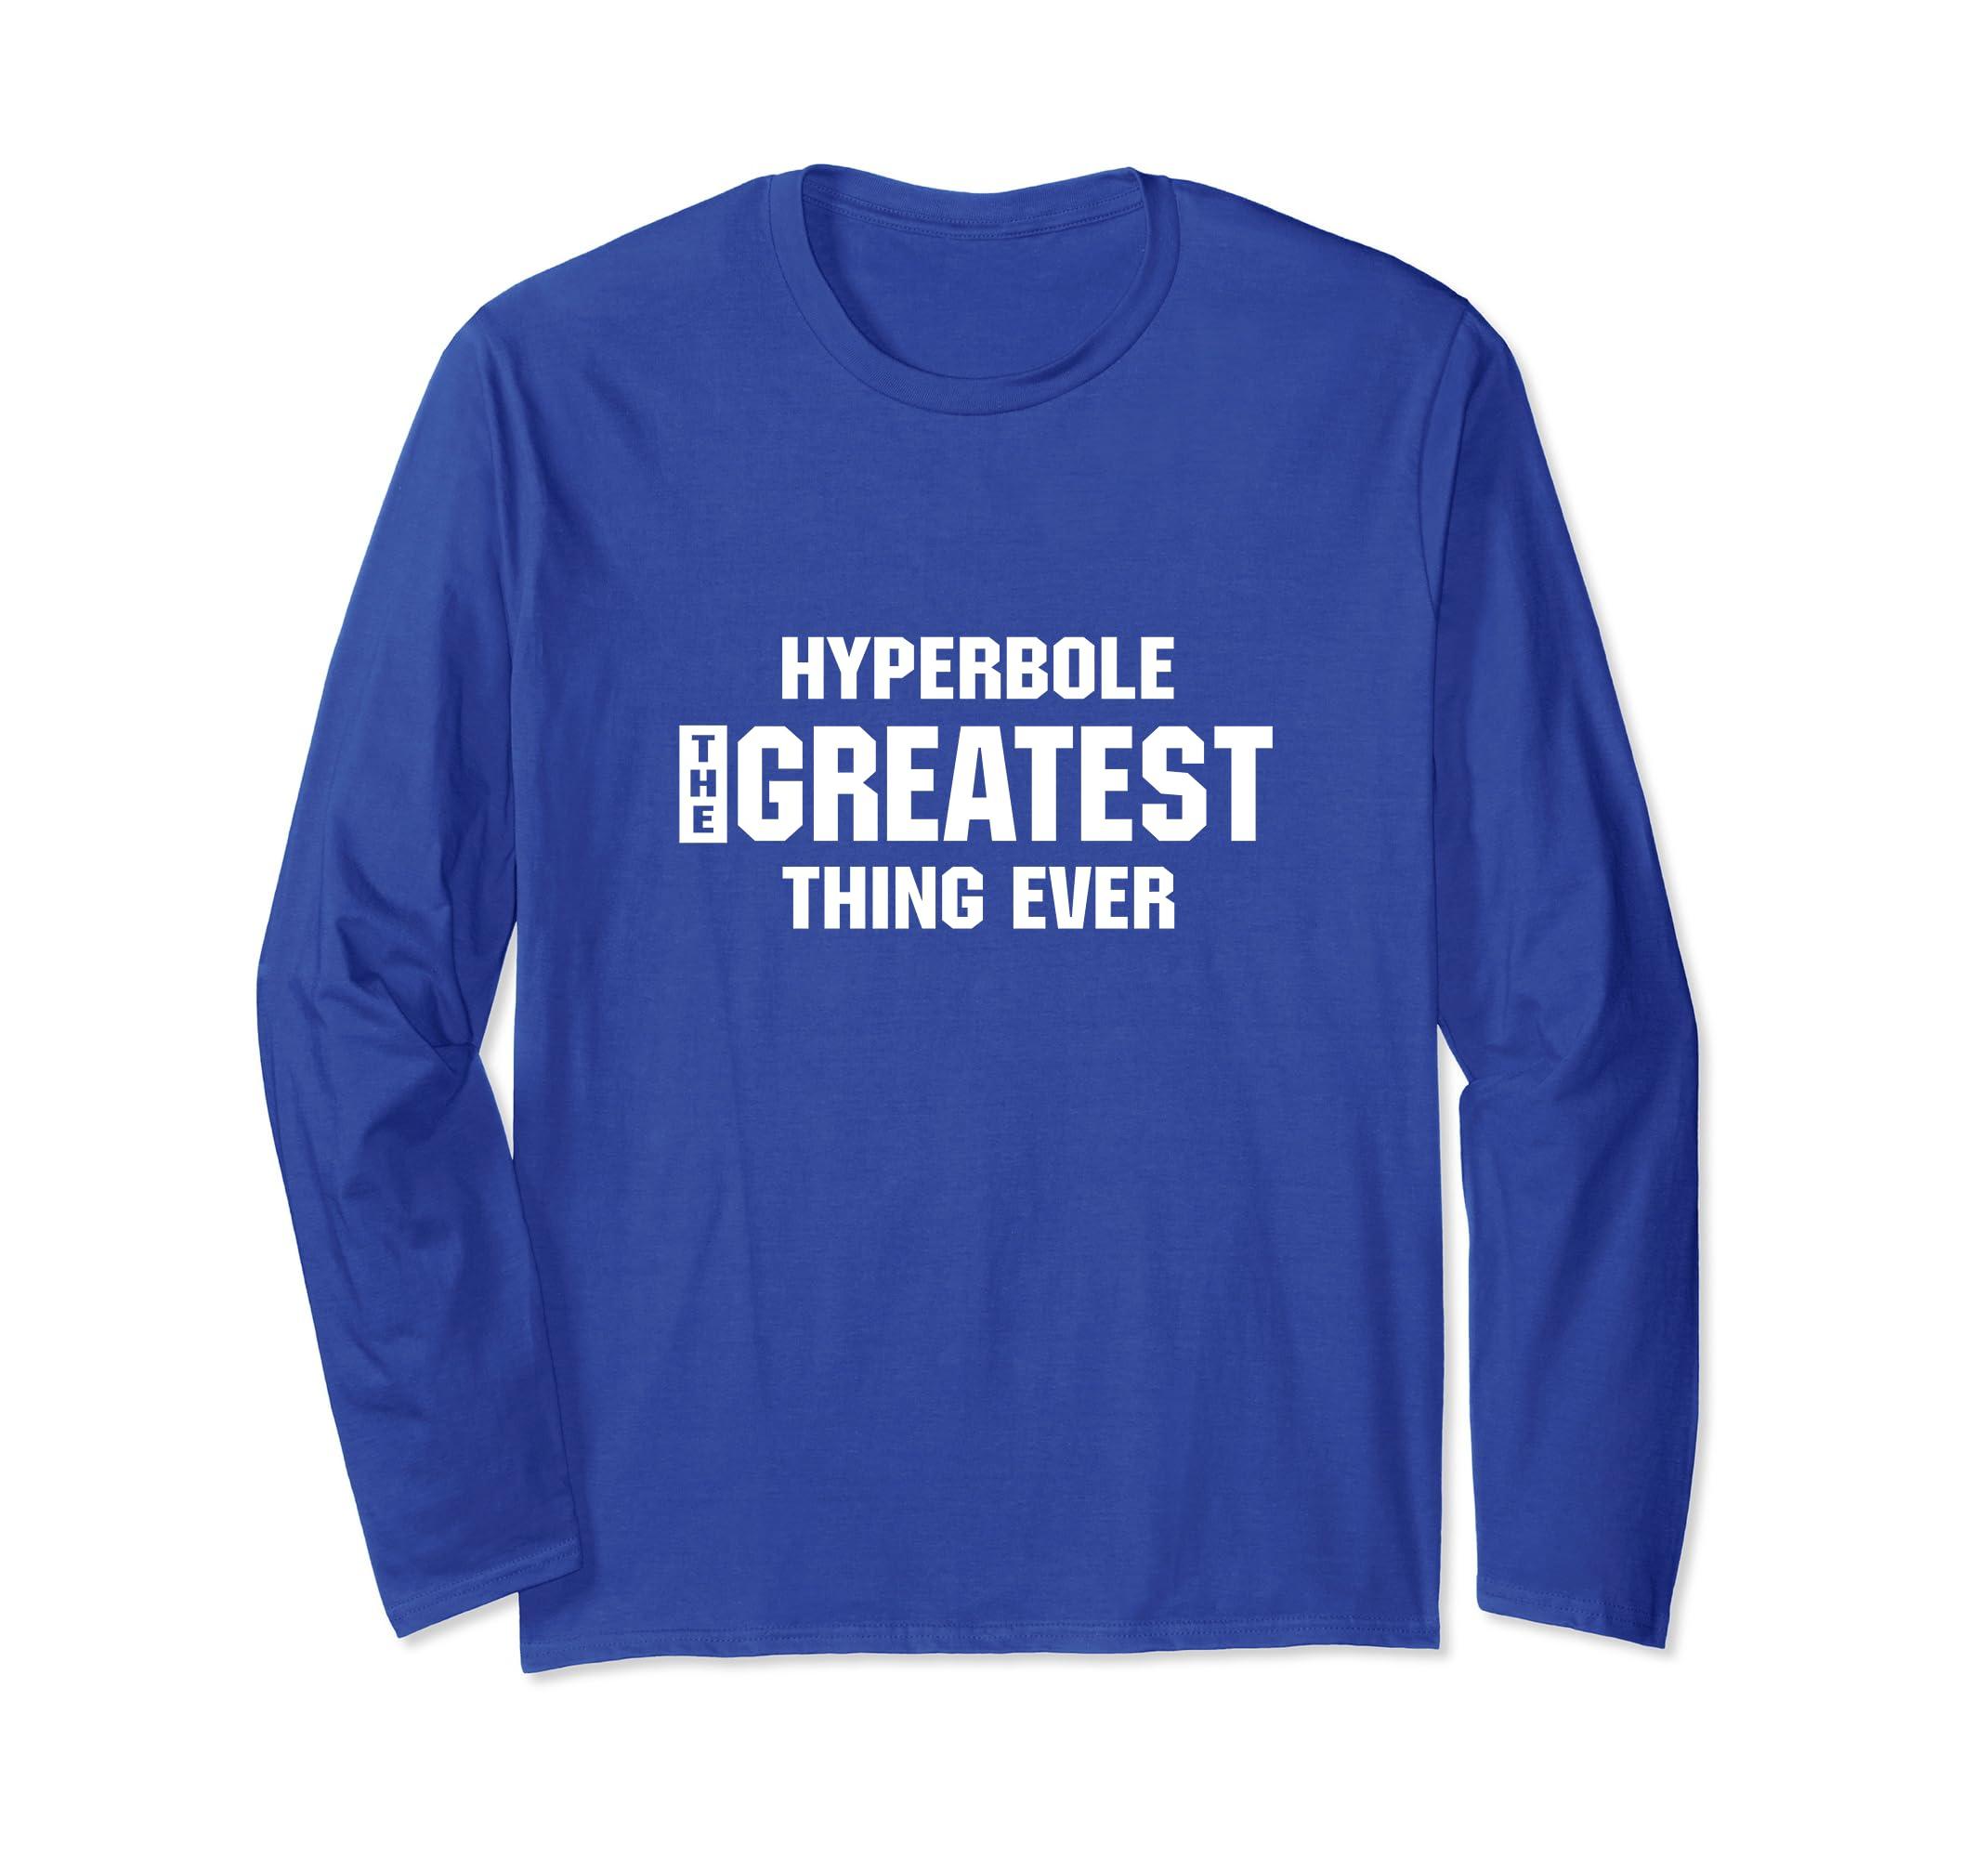 'Hyperbole The Greatest thing Ever' Long sleeve Tshirt-ln